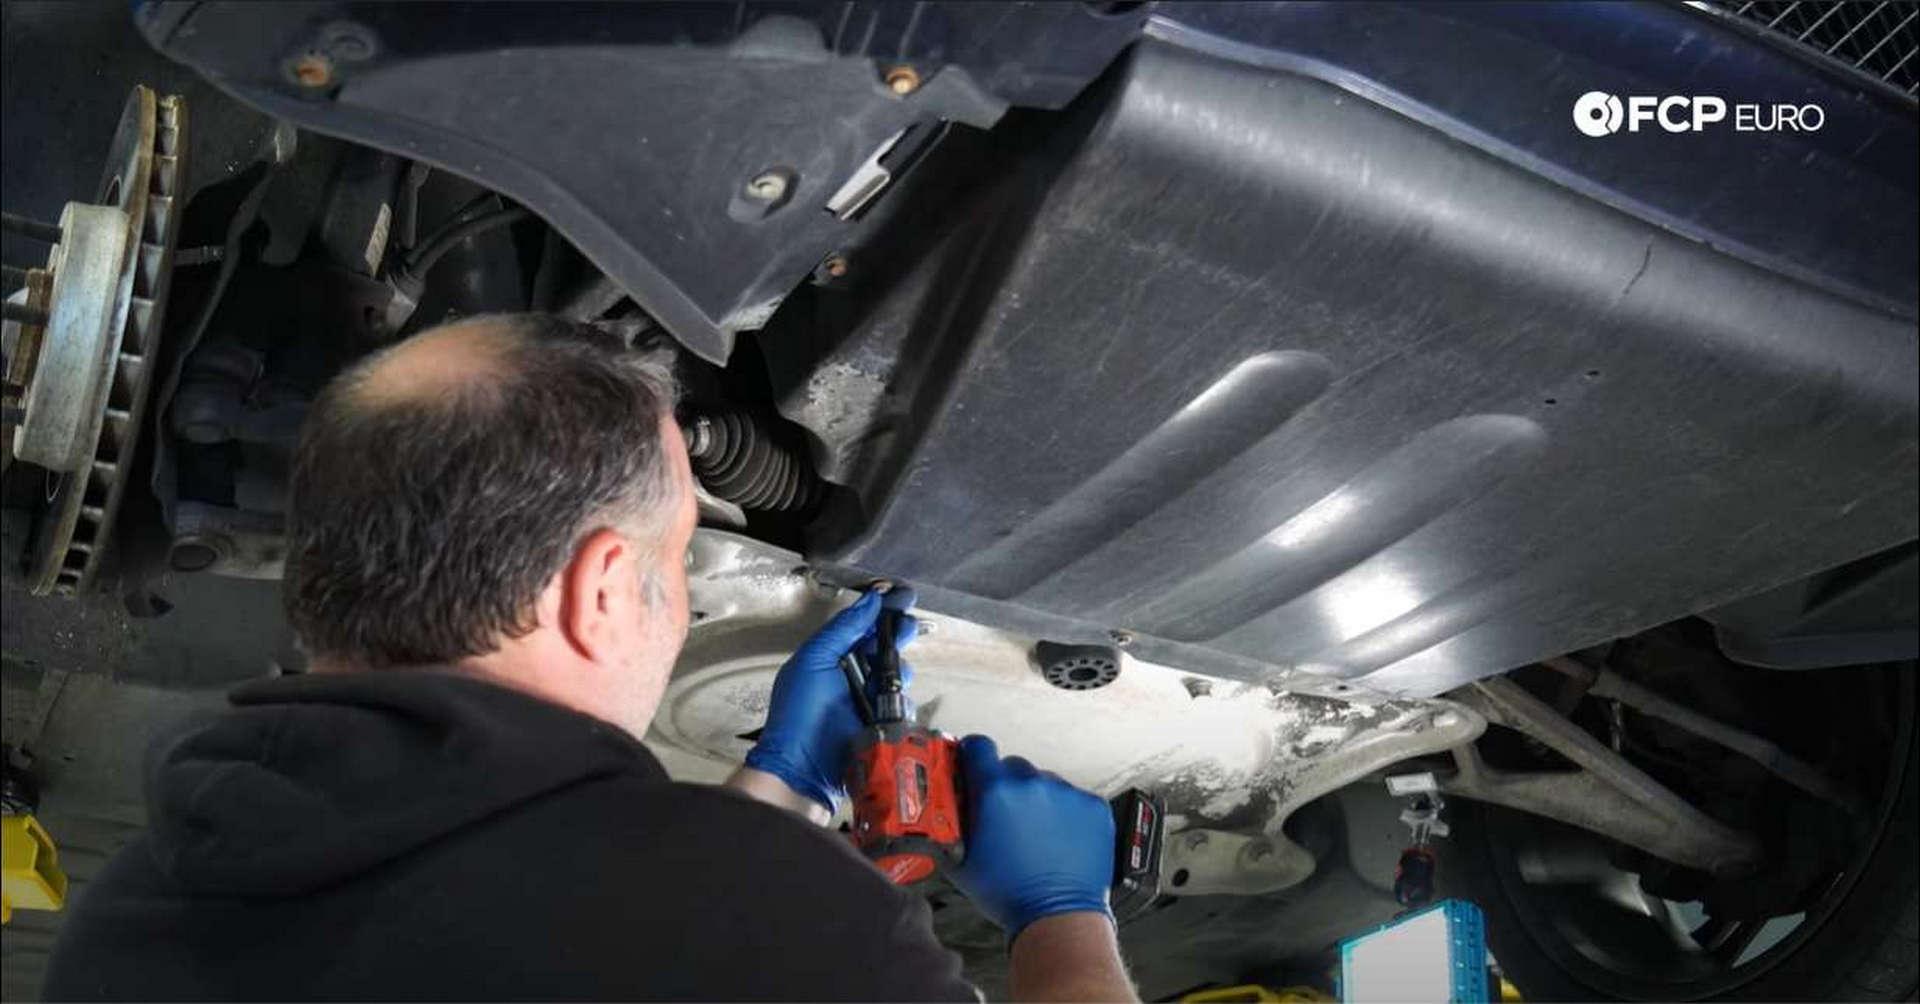 01_DIY_BMW_Front_Suspension_Refresh-Removing-Underbody